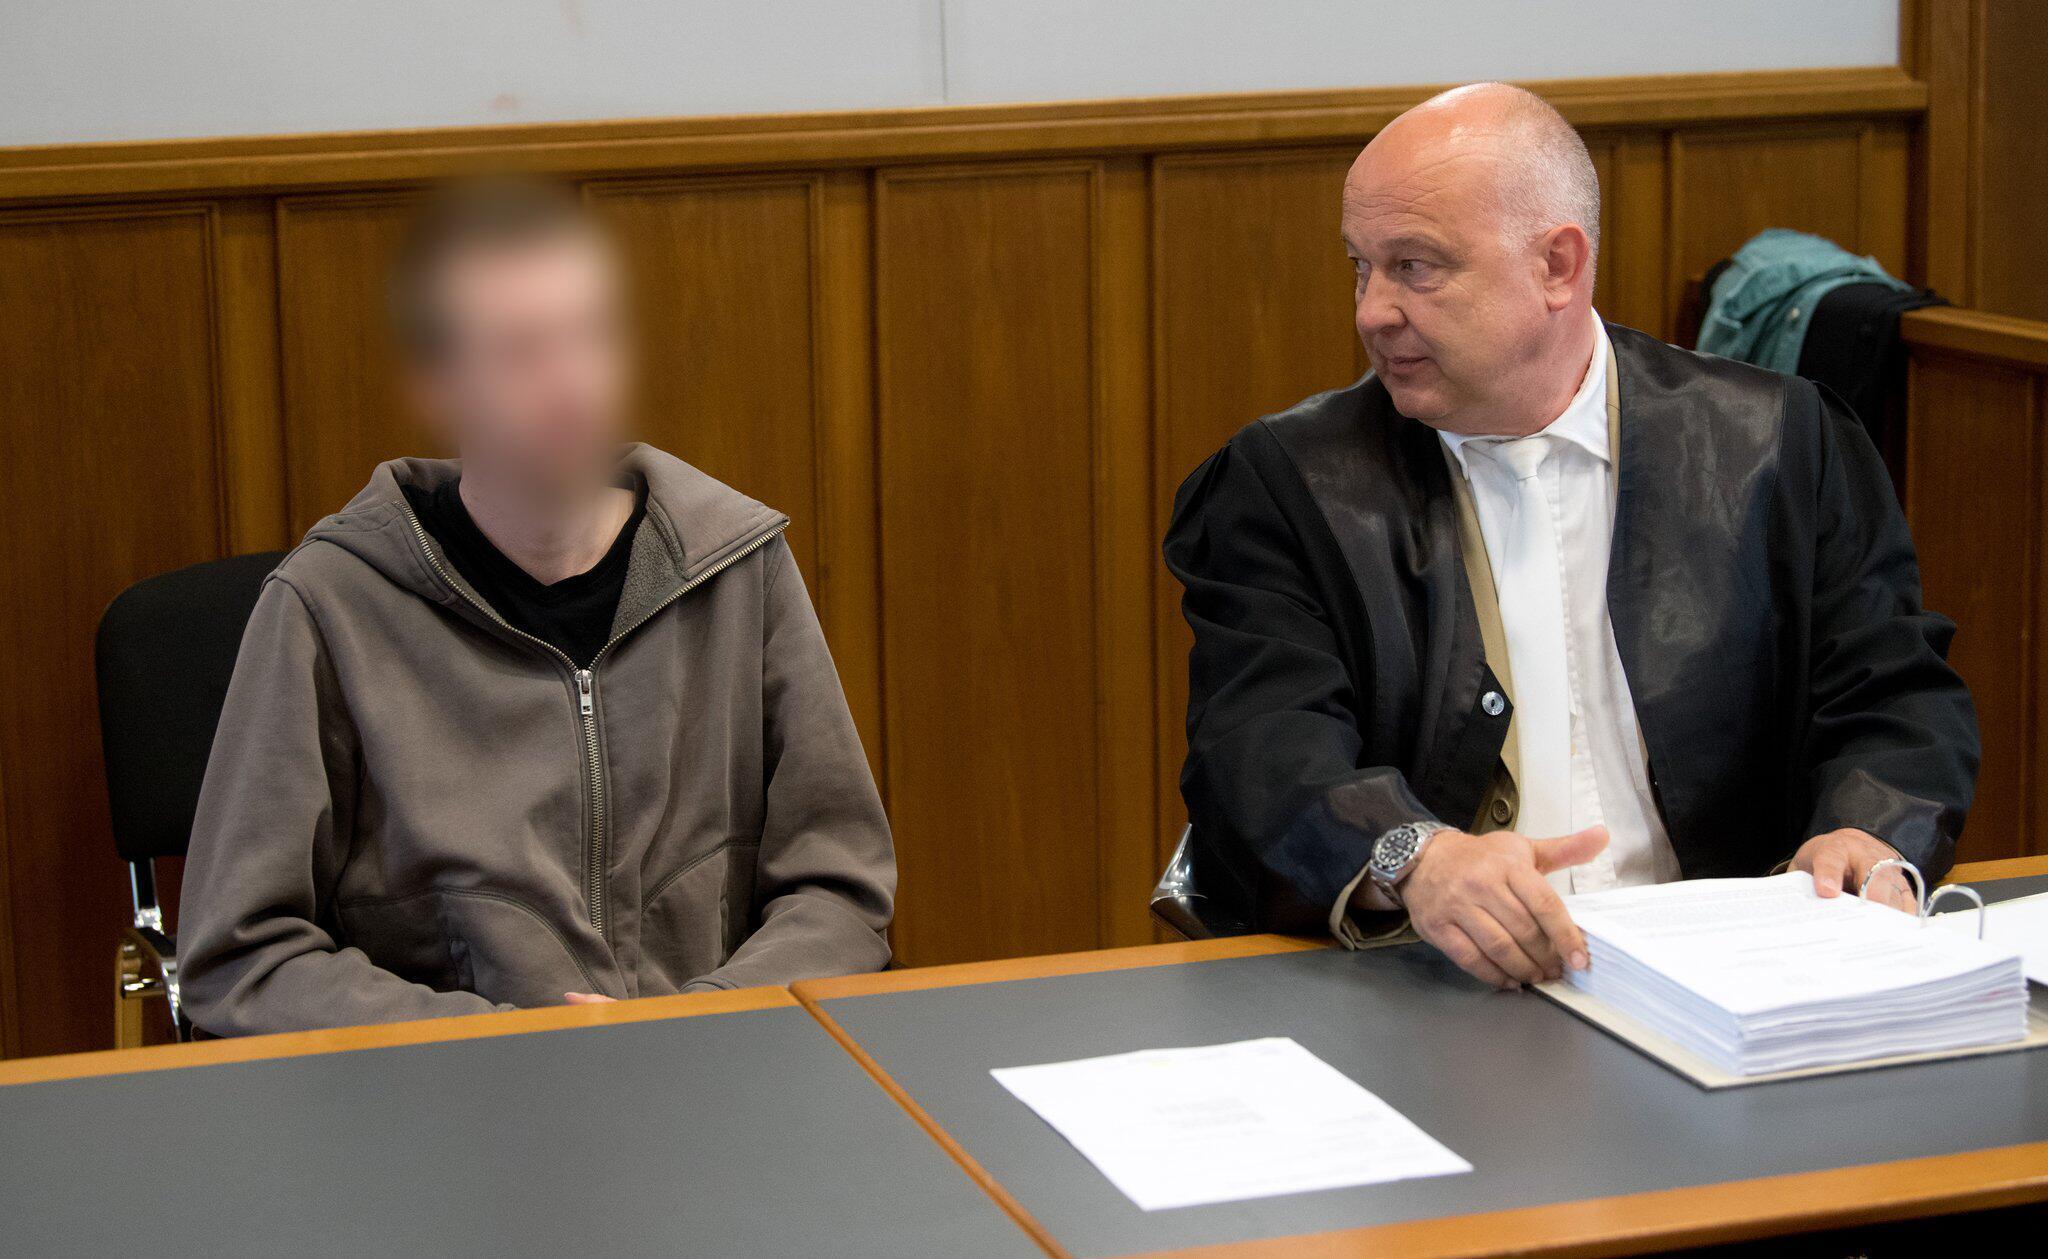 Bild zu Prozess gegen Vater der Baby tot geschüttelt haben soll